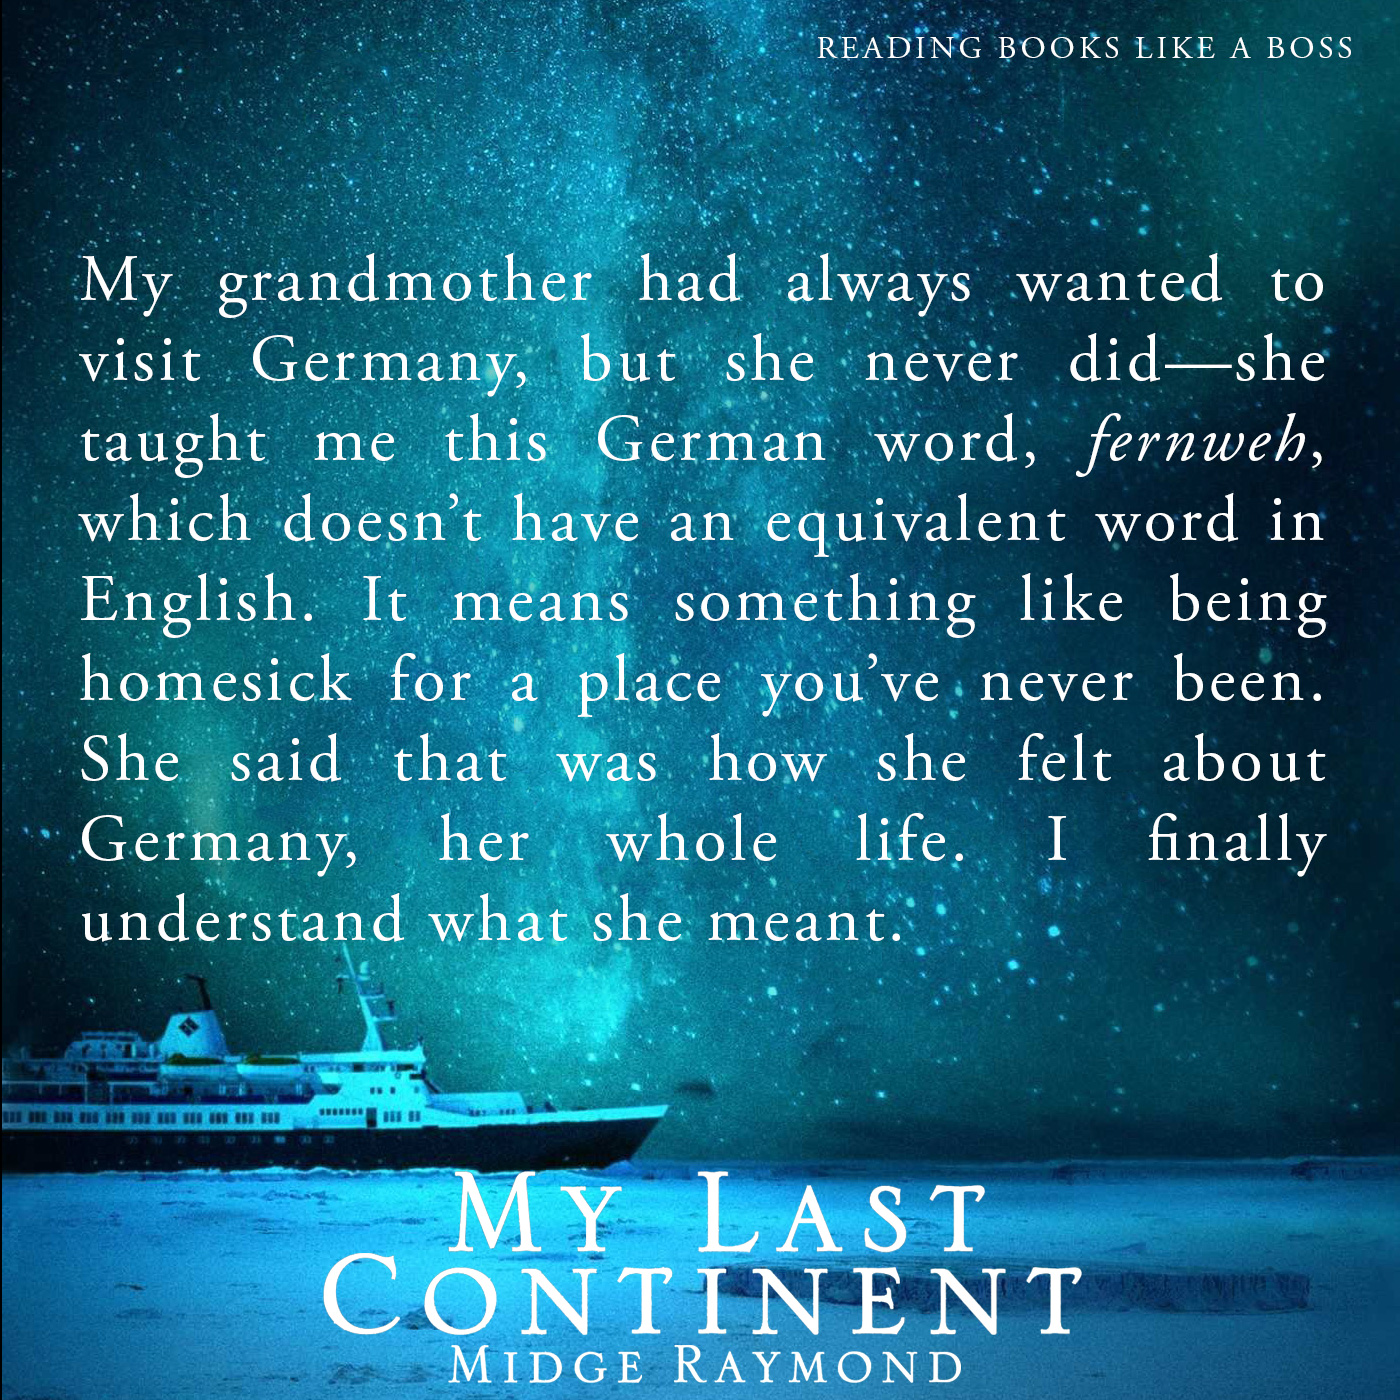 Quote - My Last Continent by Midge Raymond